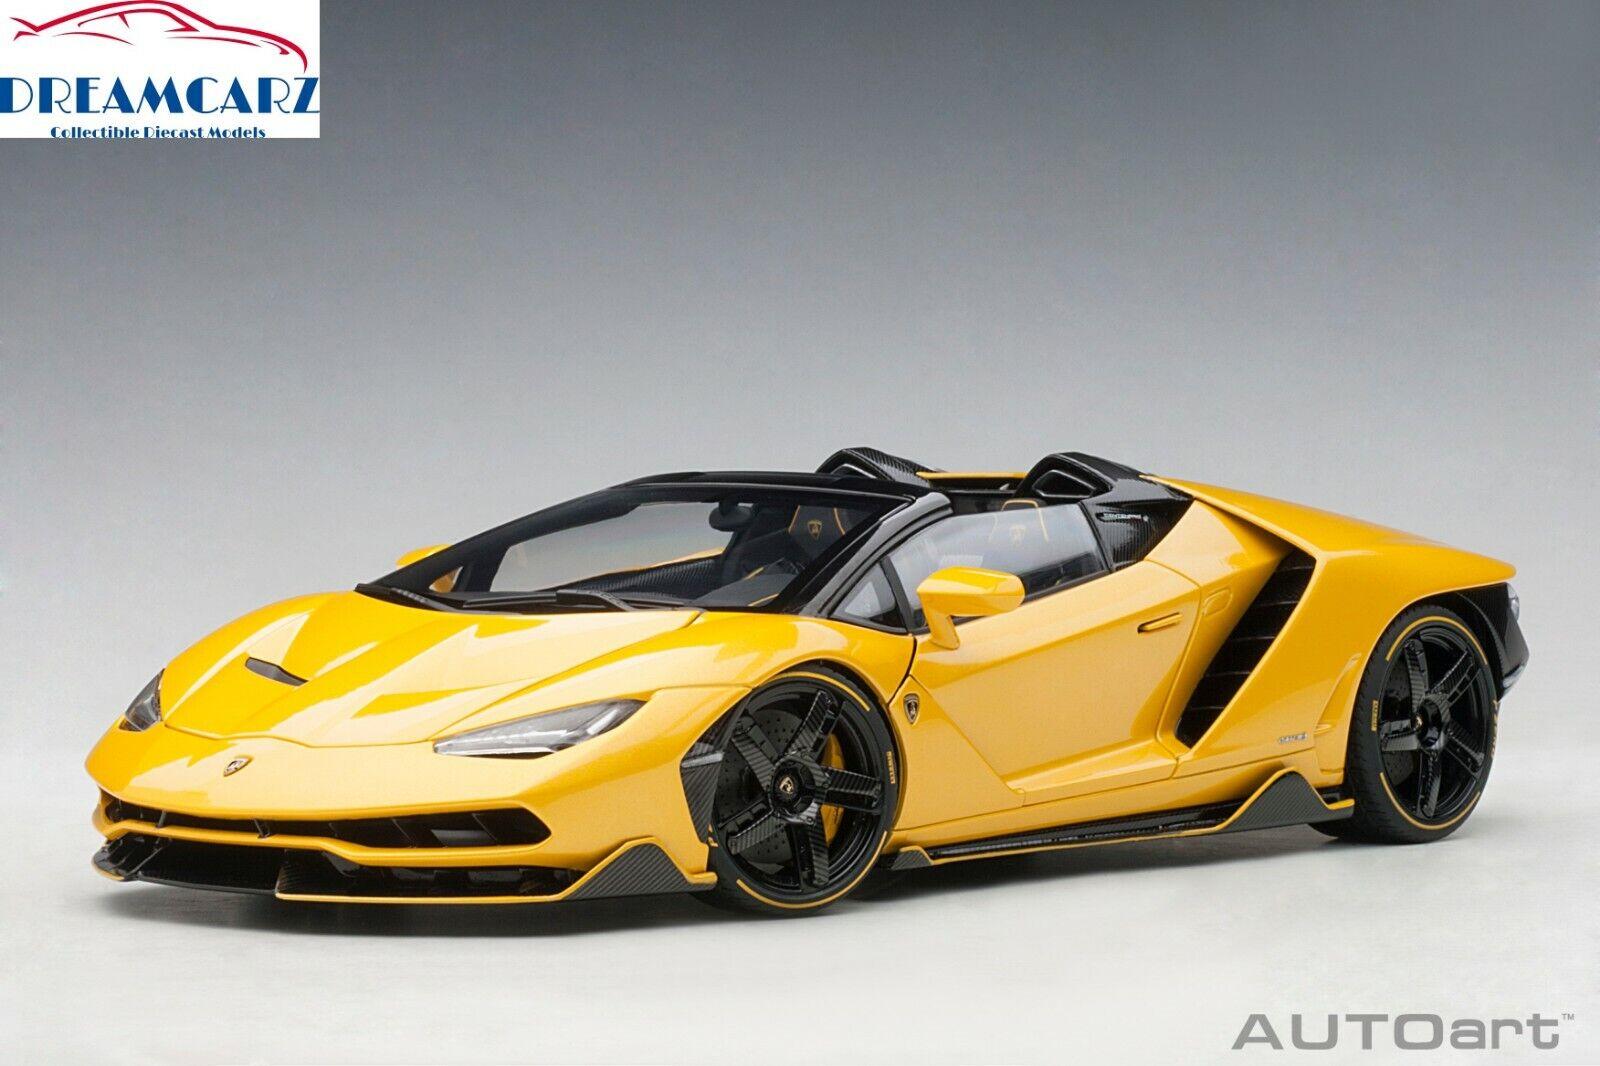 AUTOart 79117 1 18 Lamborghini Centenario Roadster - yellow Inti (Pearl Yellow)